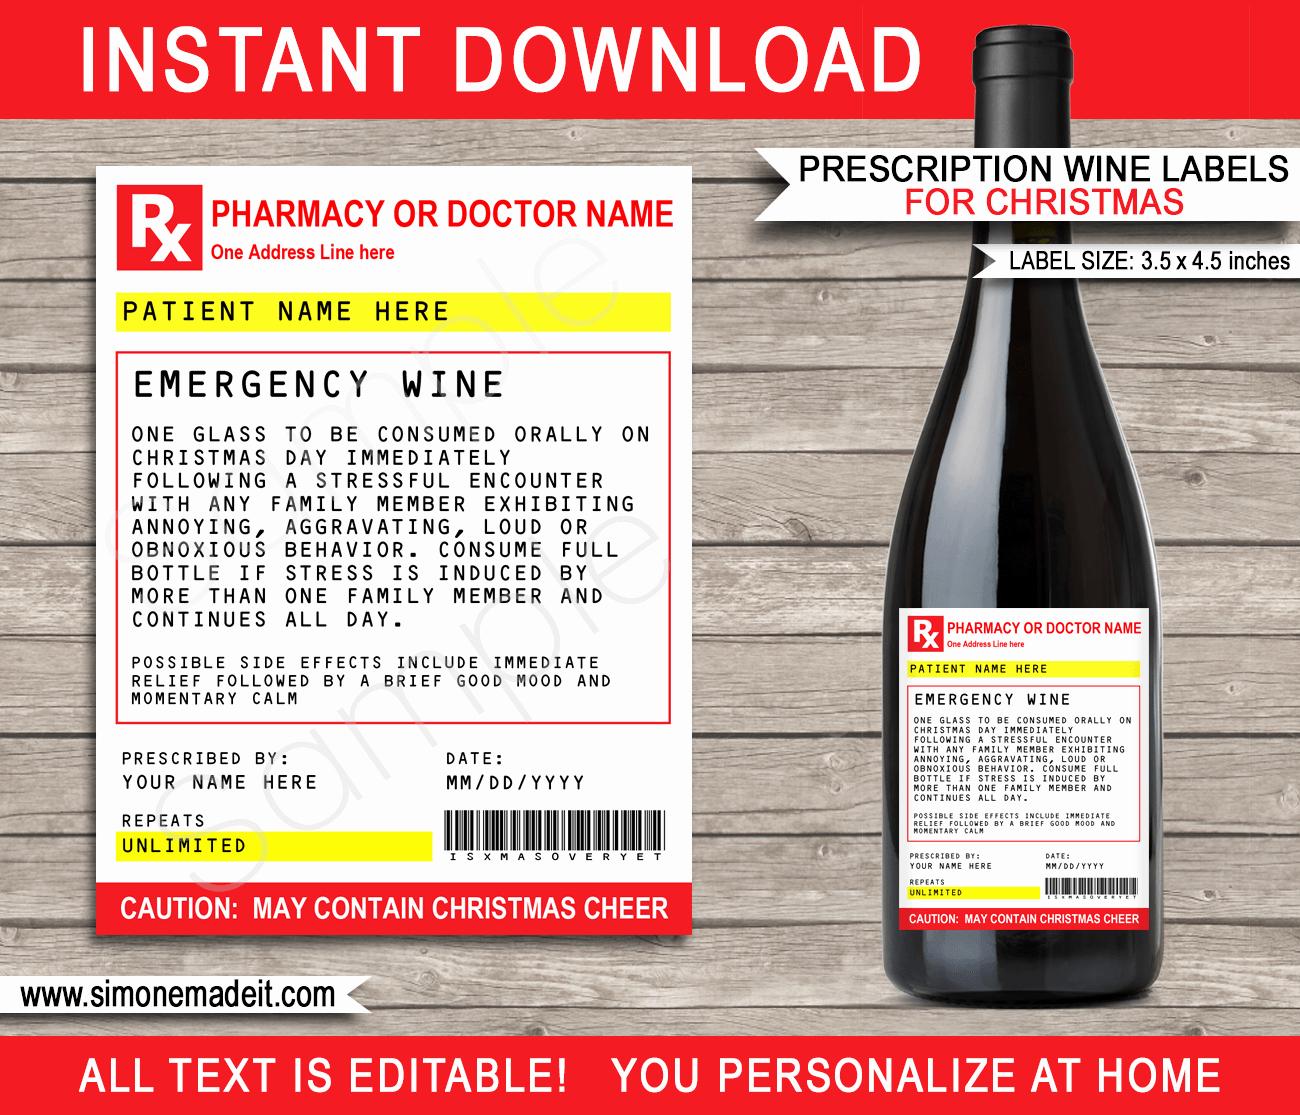 Pill Bottle Label Template Lovely Christmas Prescription Wine Bottle Labels Template Secret